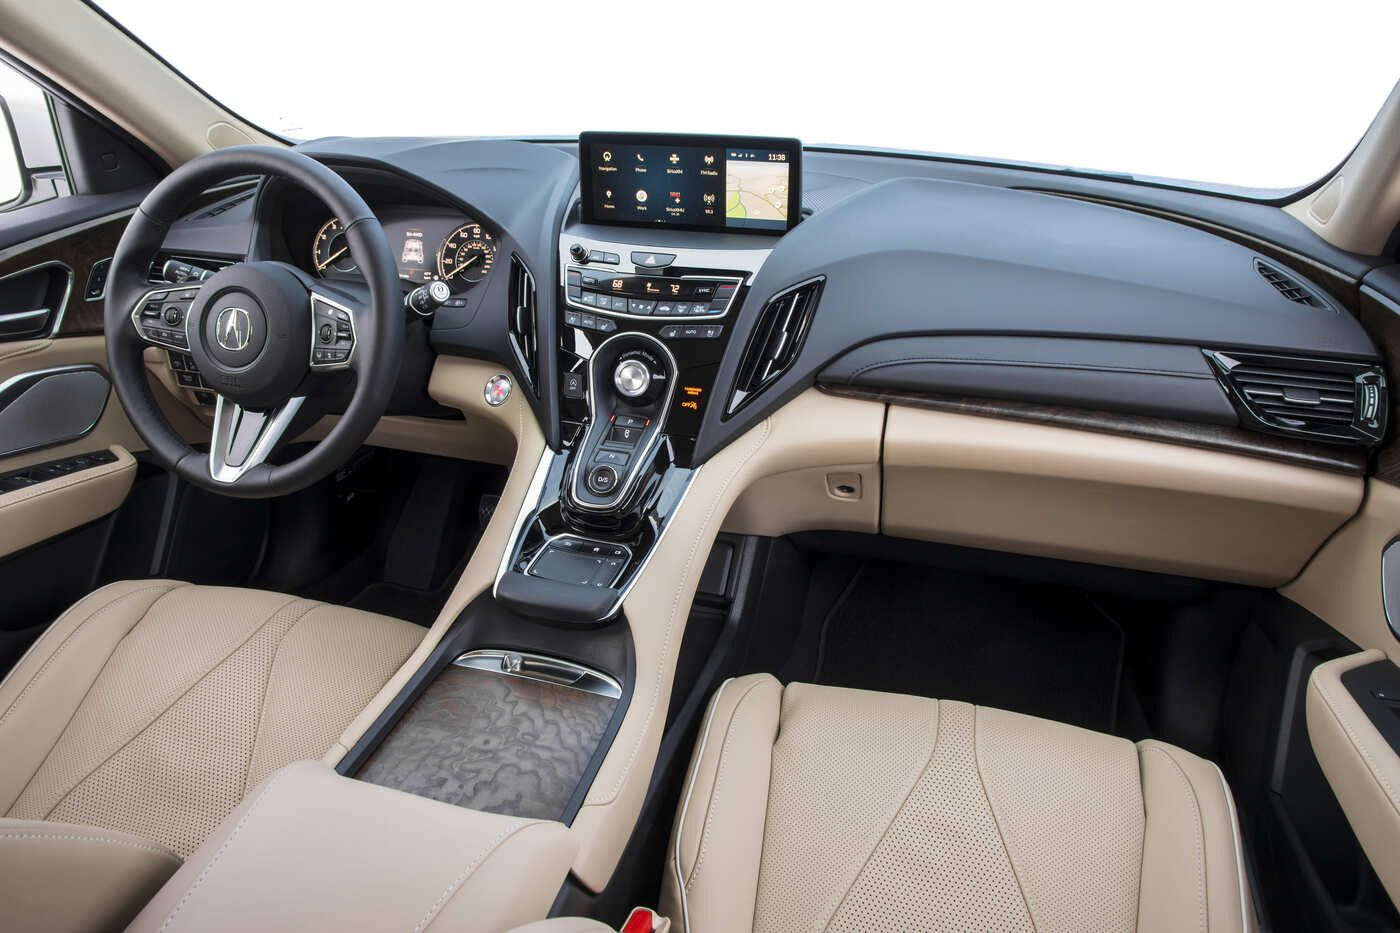 2020 Acura Rdx Interior First Drive Check More At Http Dailymaza Me 2020 Acura Rdx Interior First Drive Di 2020